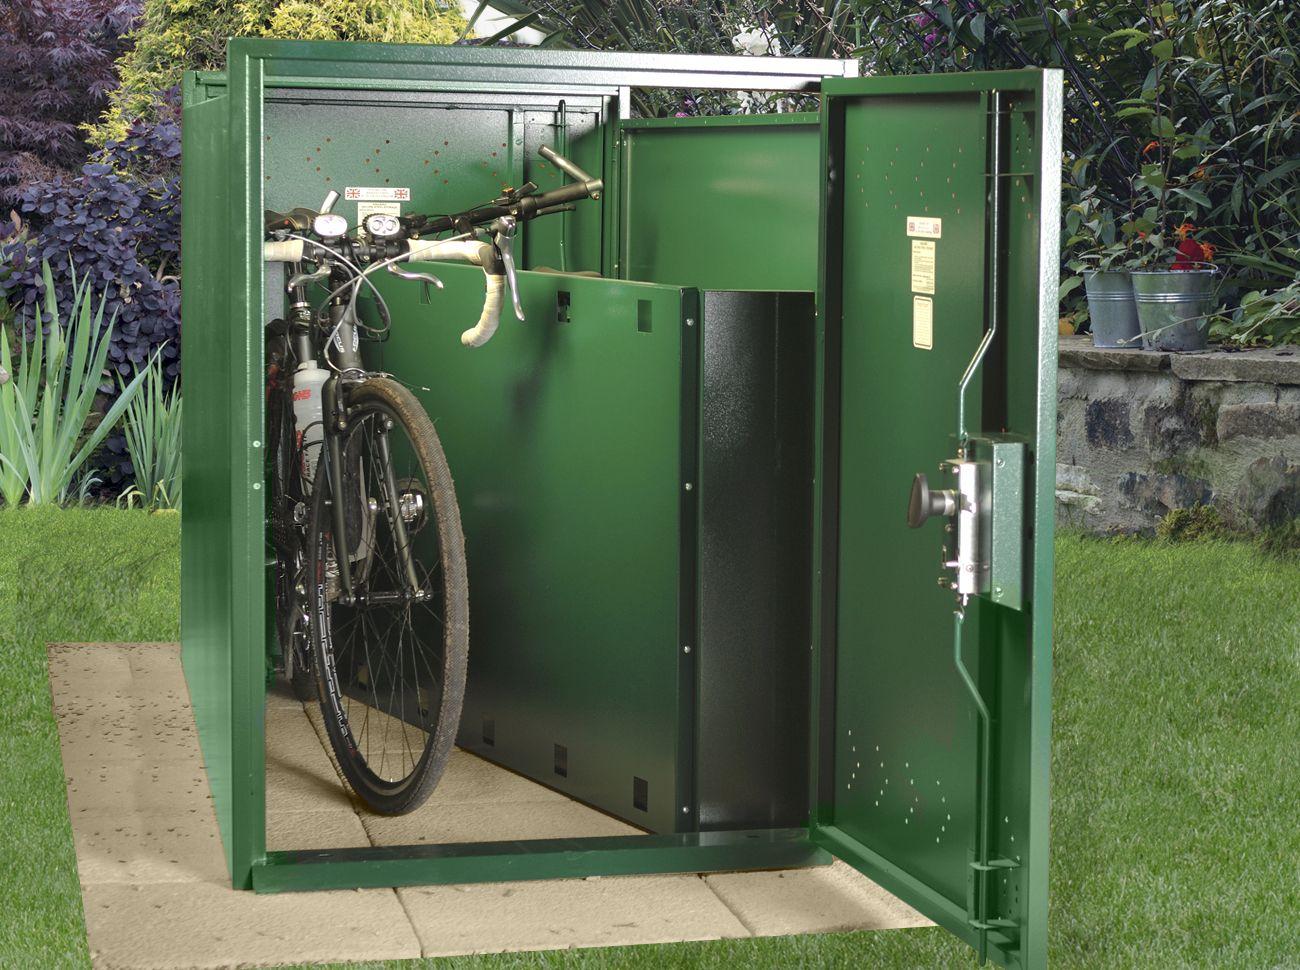 Double Ended Metal Bike Shelter Outdoor Bike Storage Bike